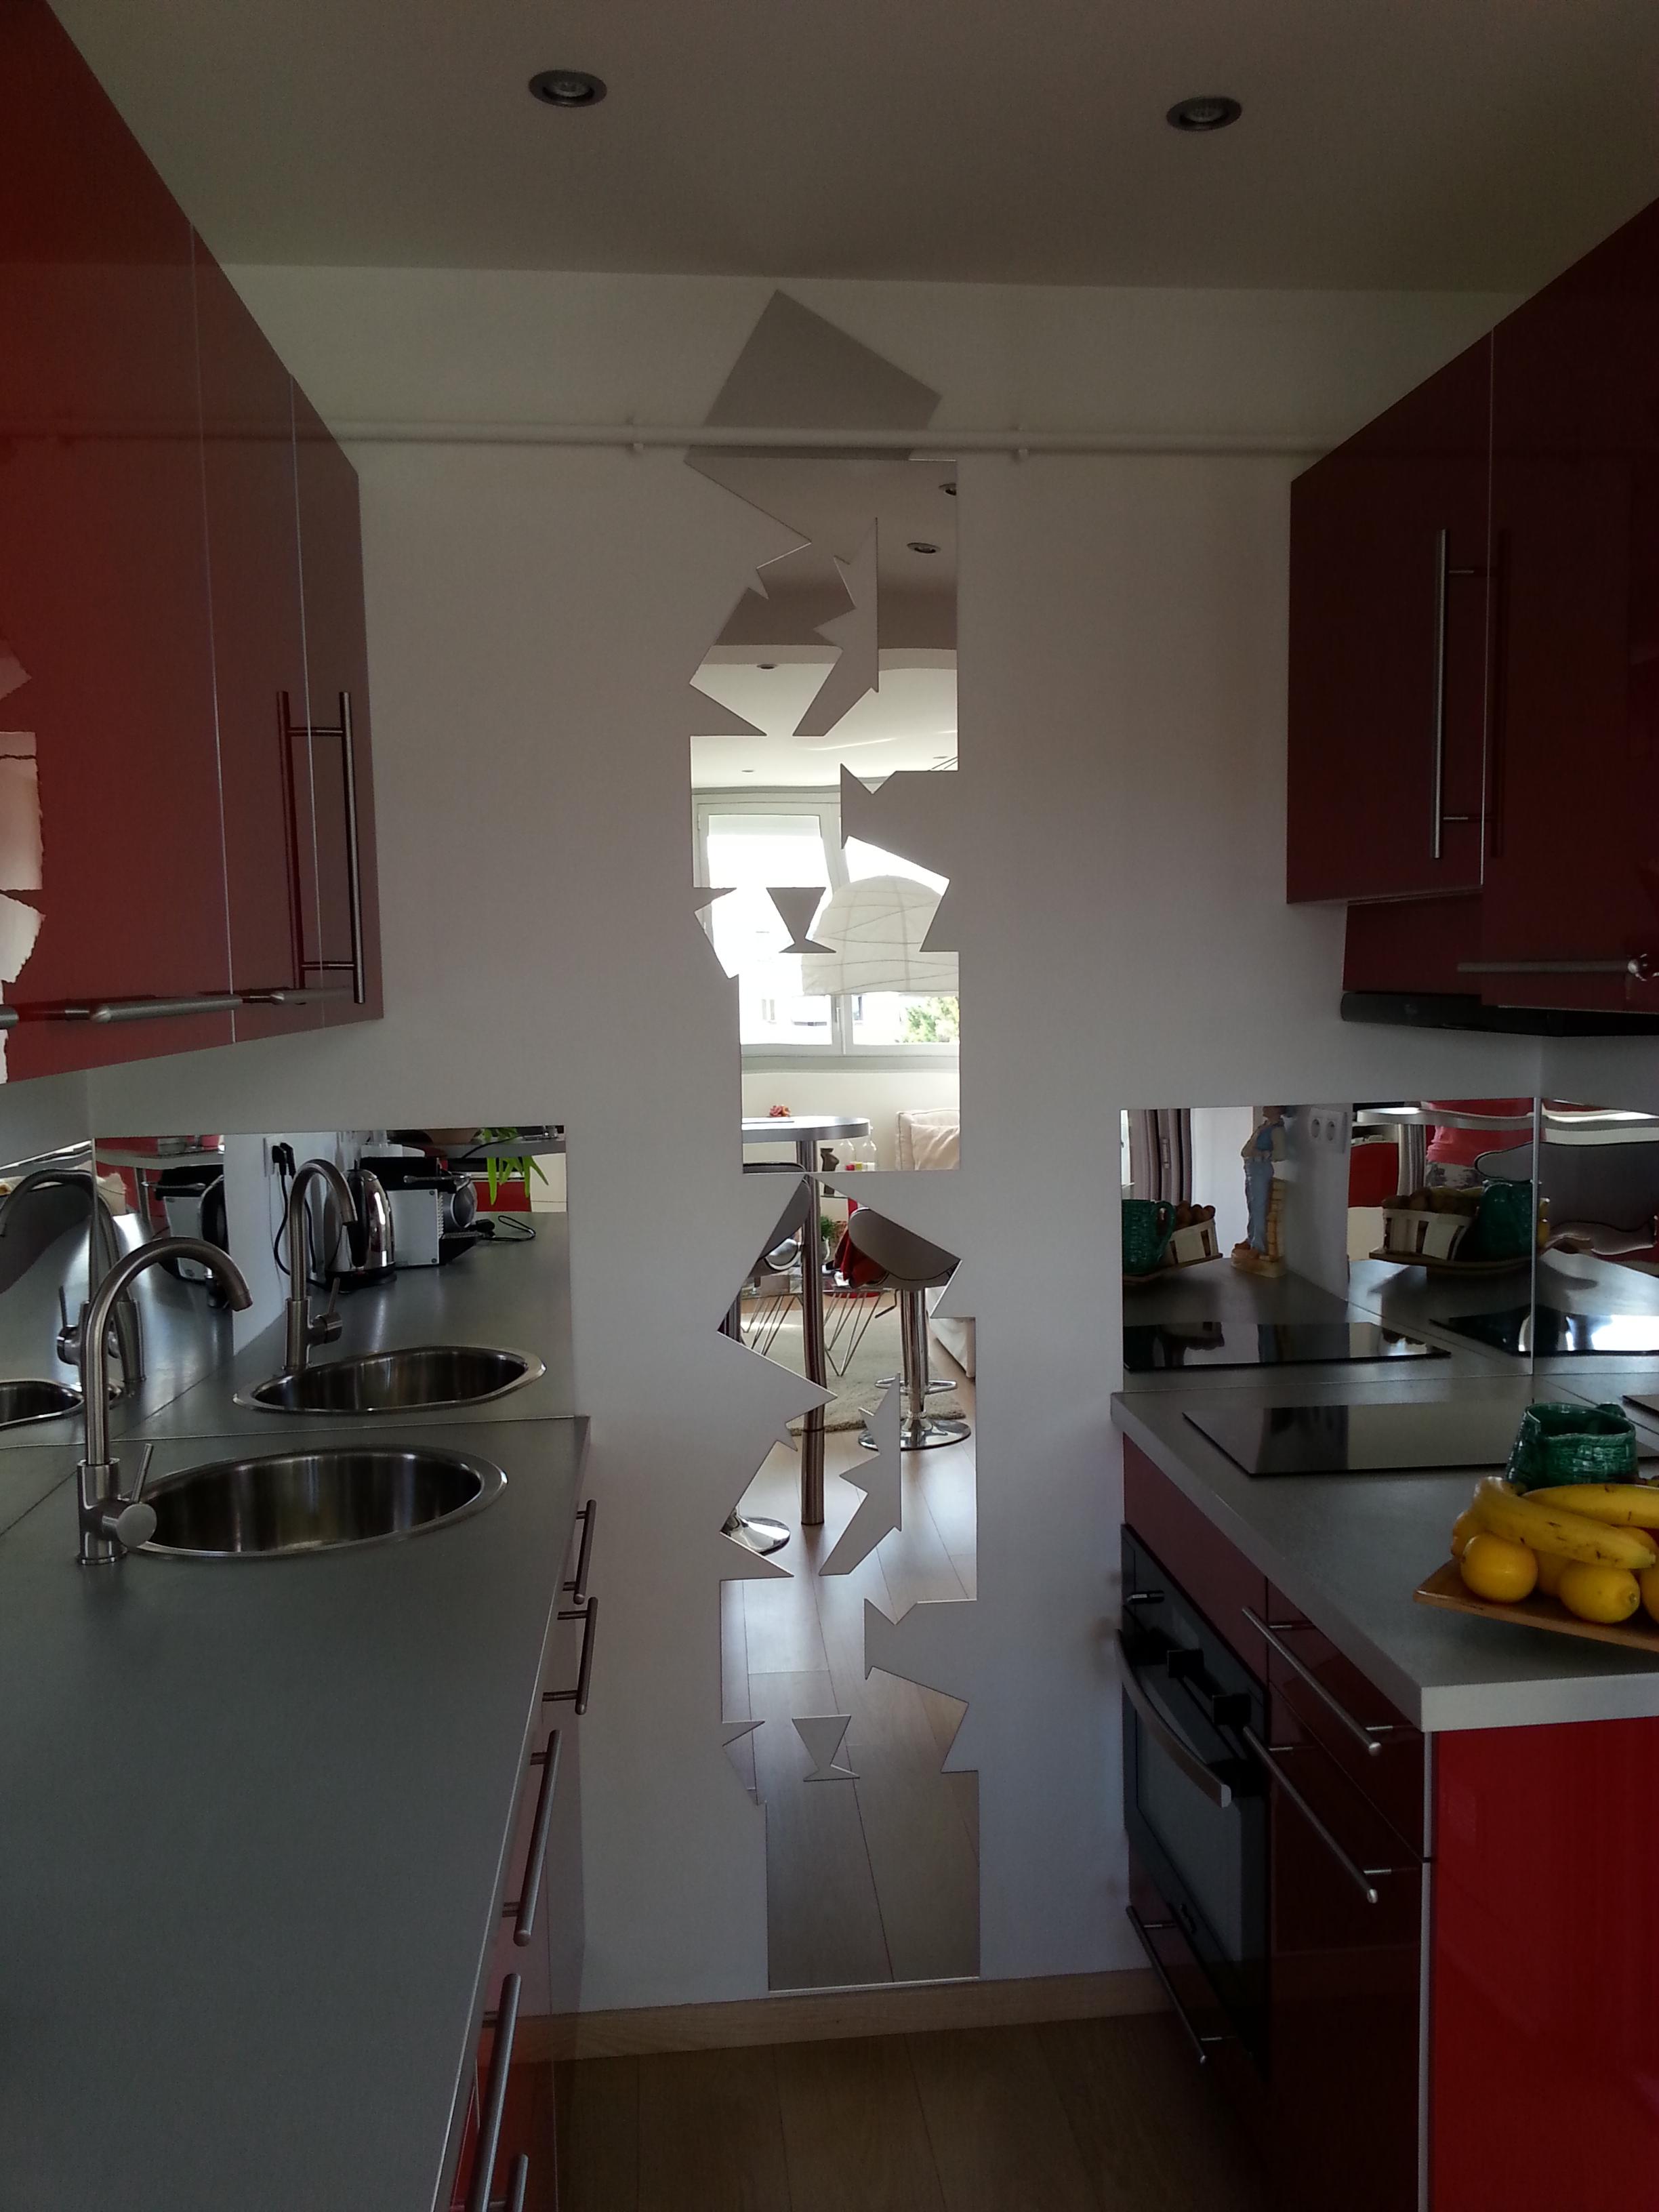 http://www.blog-decoration-miroir.fr/images/cuisine2.jpg